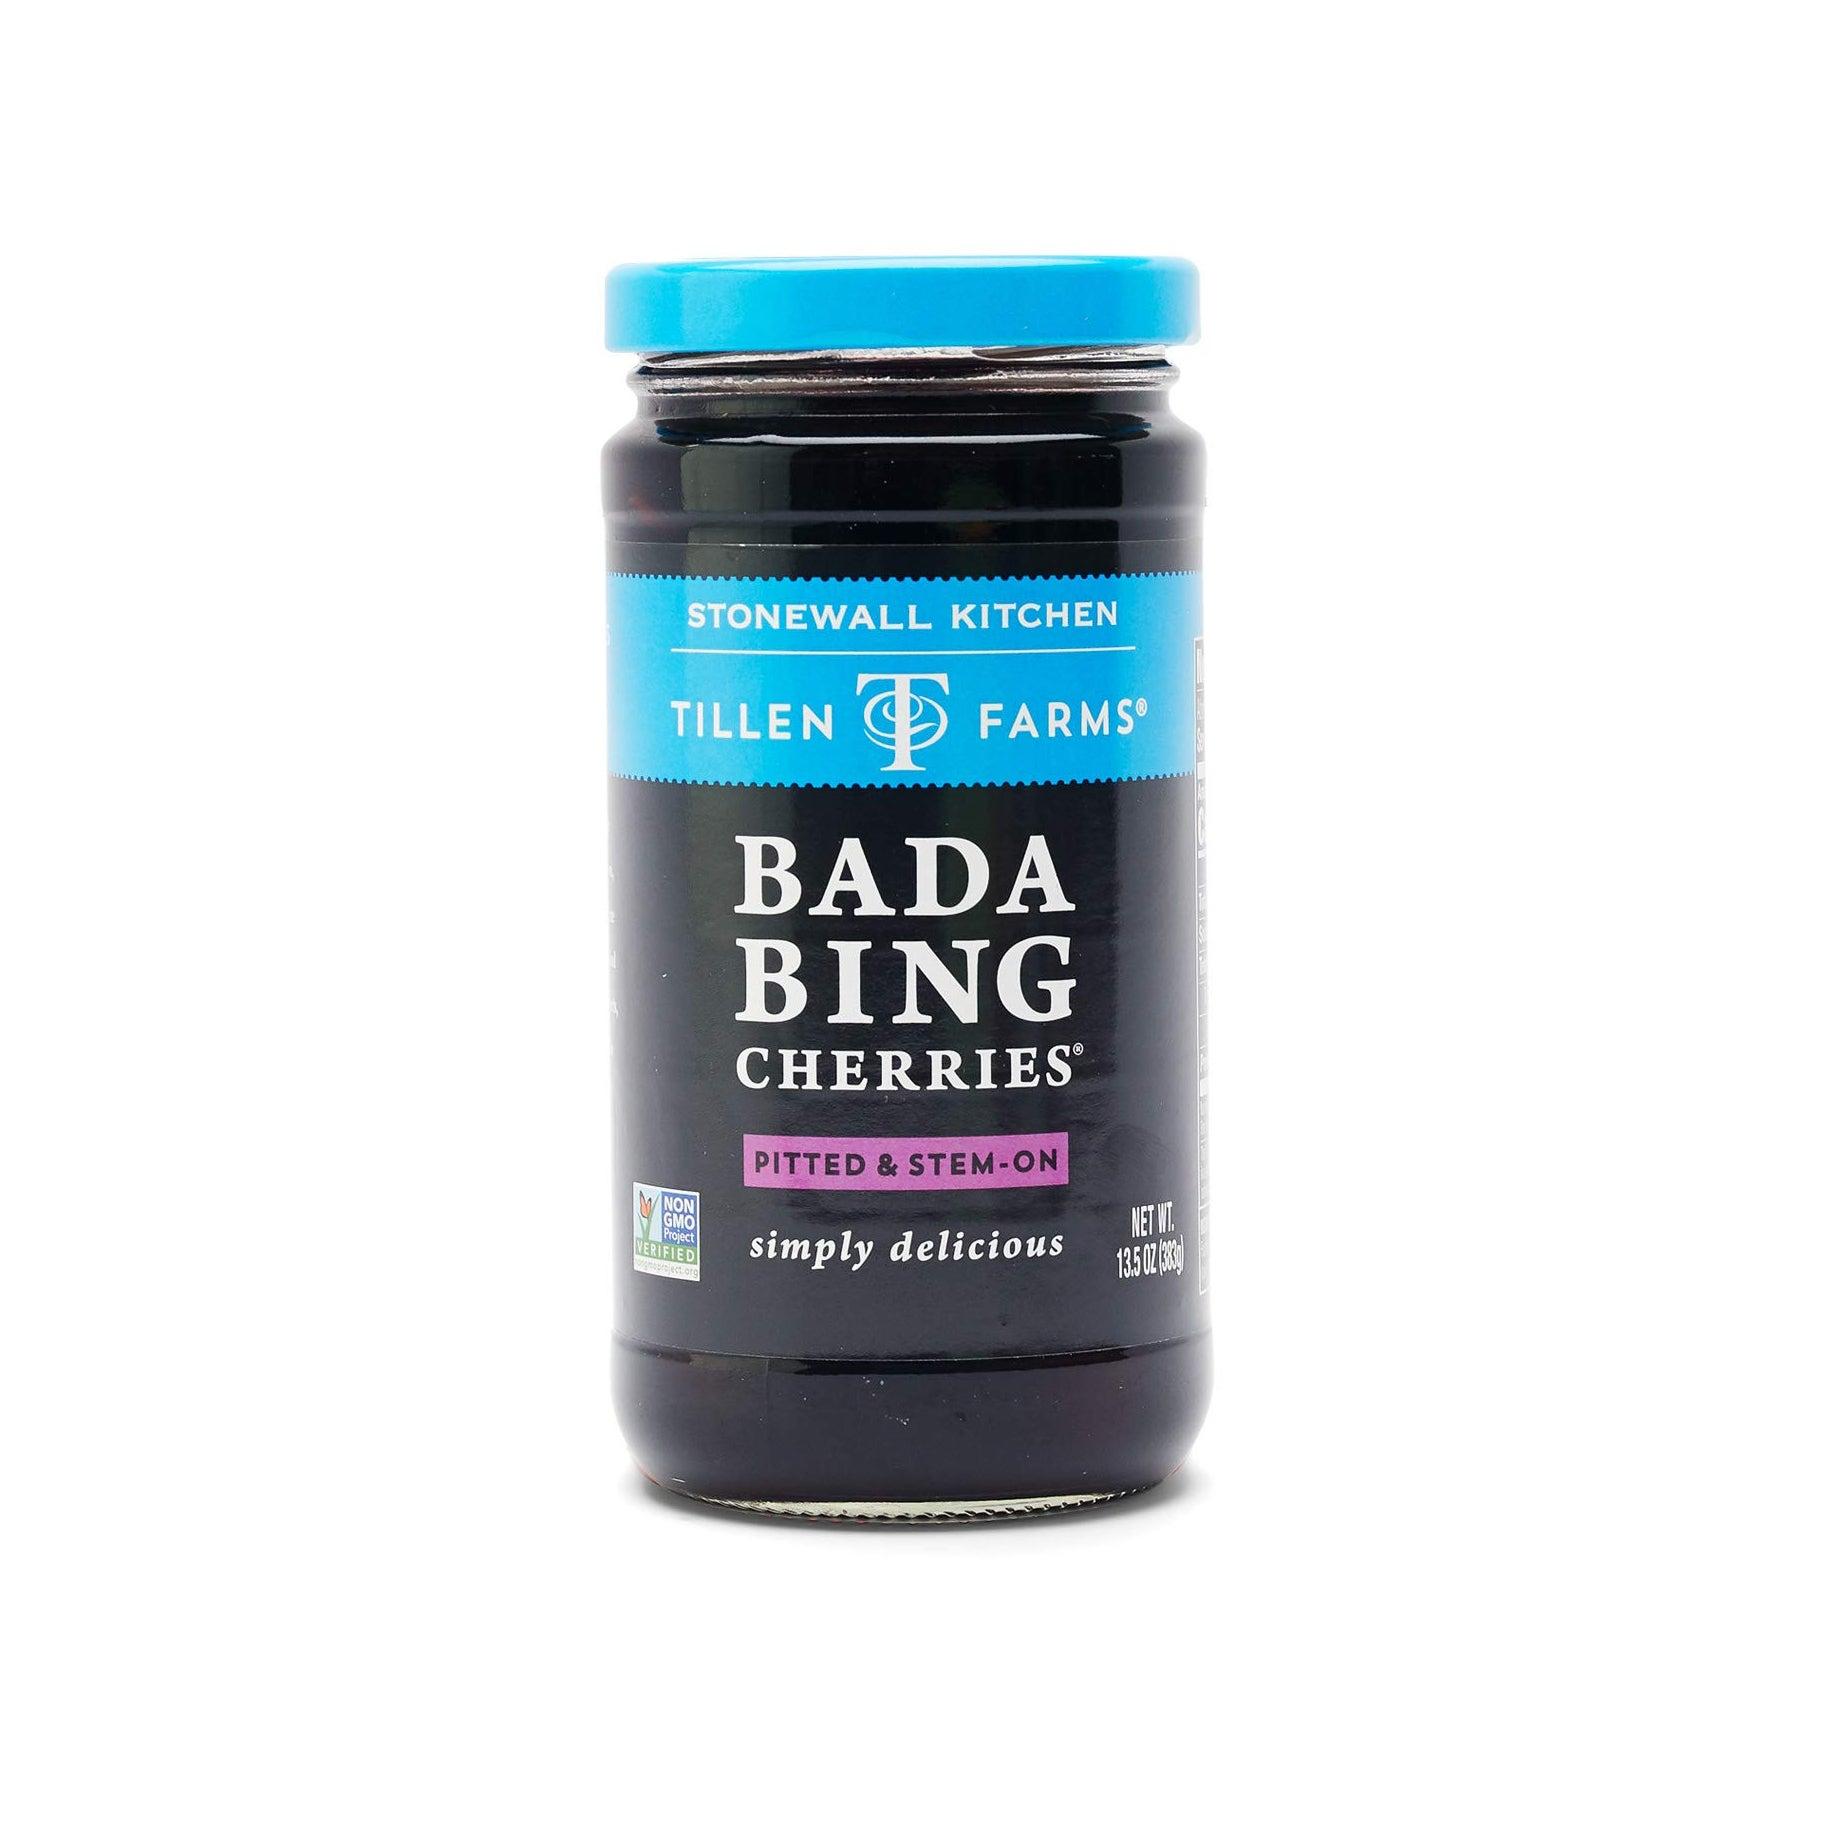 The-Best-Cocktail-Cherries-Option-Bada-Bing-Cherries-By-Tillen-Farms